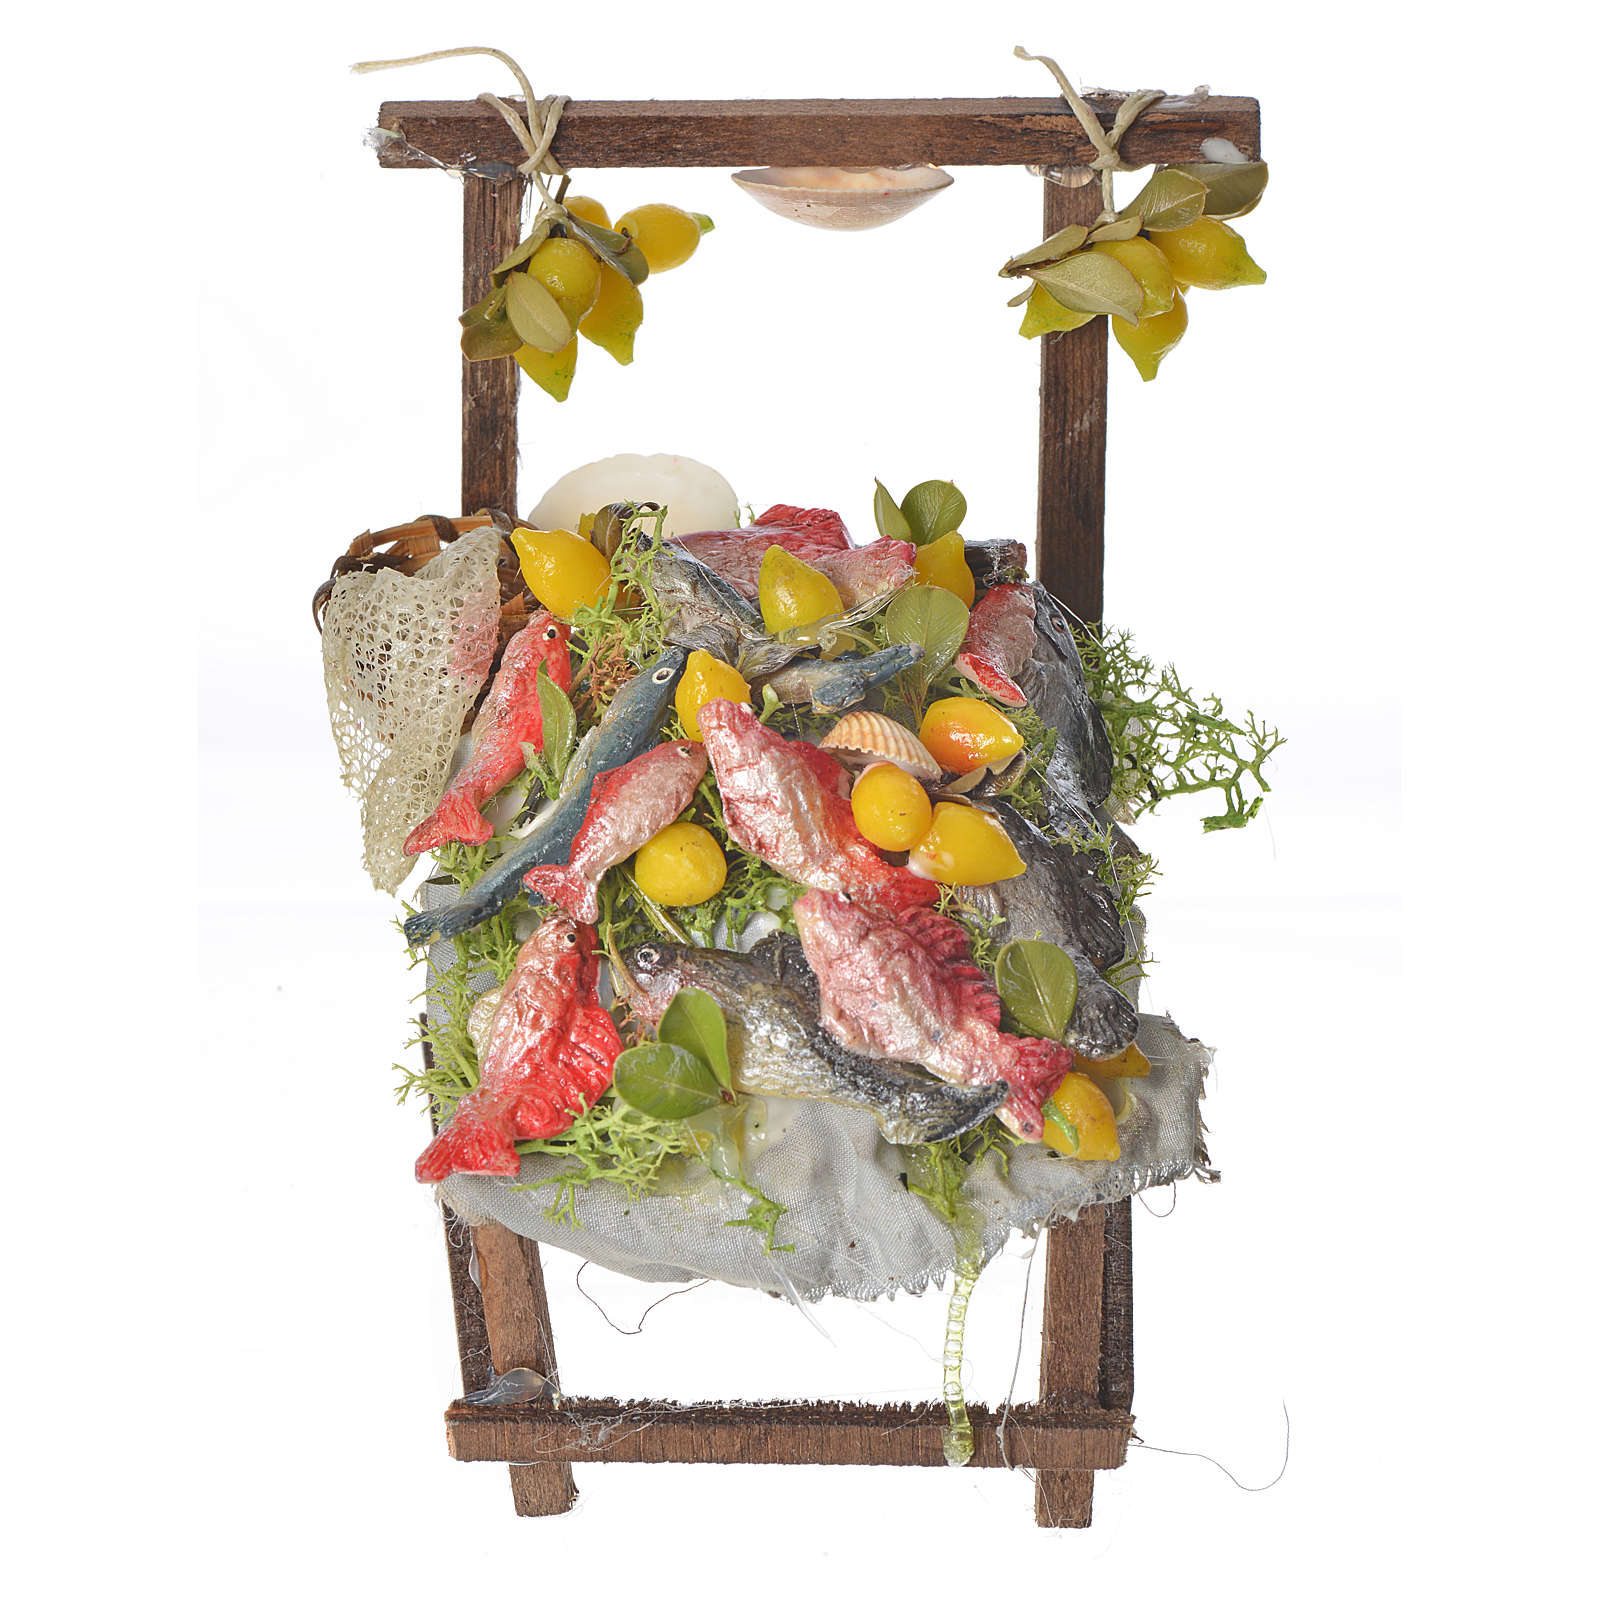 Nativity accessory, fishmonger's stall in wax 10x9x14cm 4